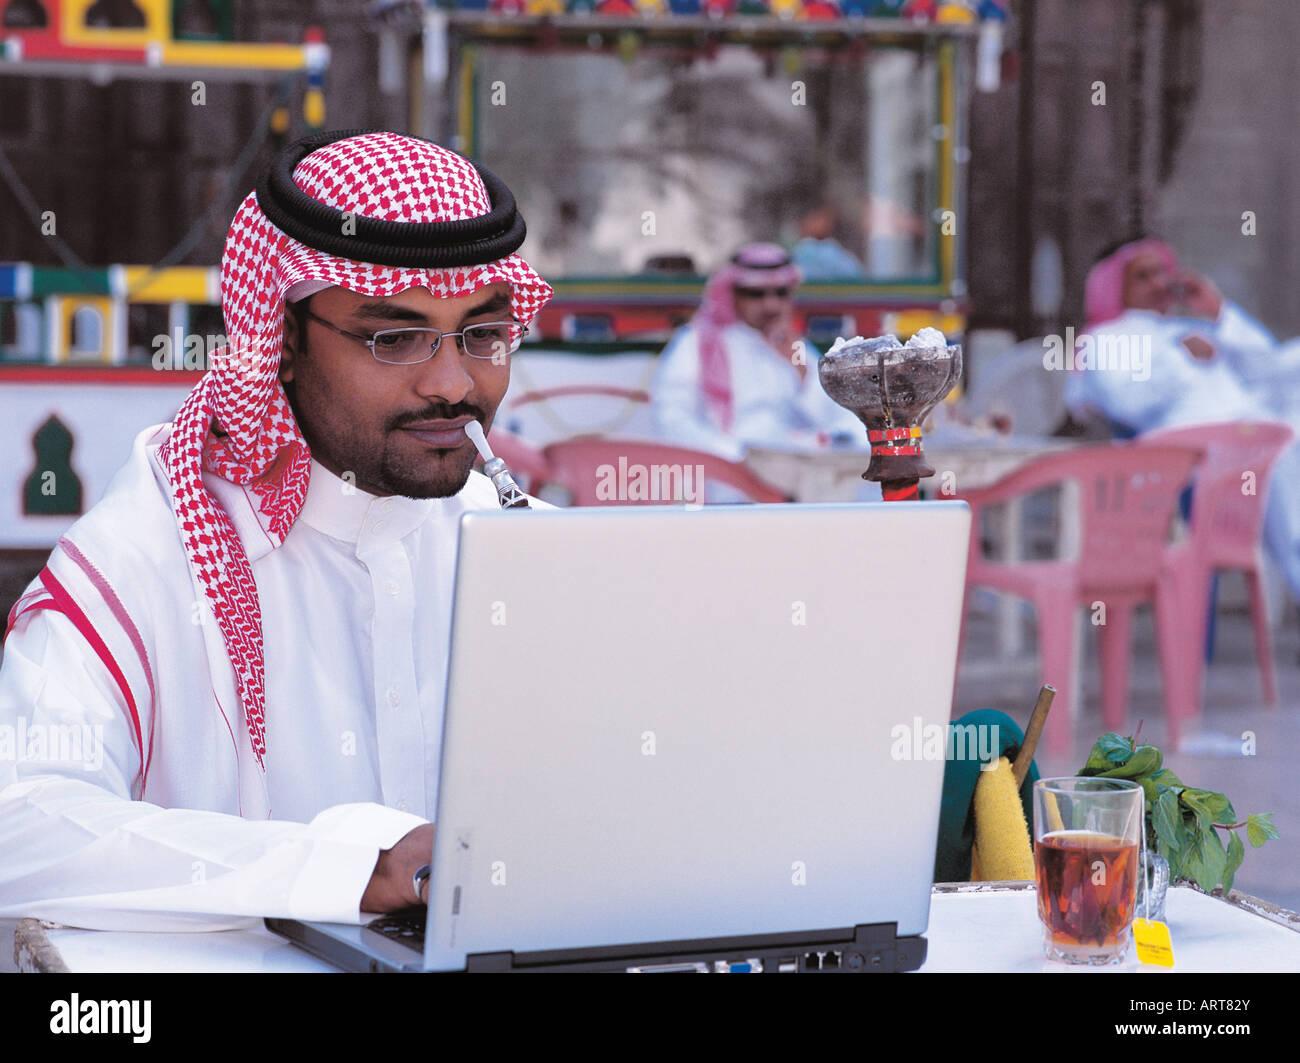 from Shane dating saudi arabian man